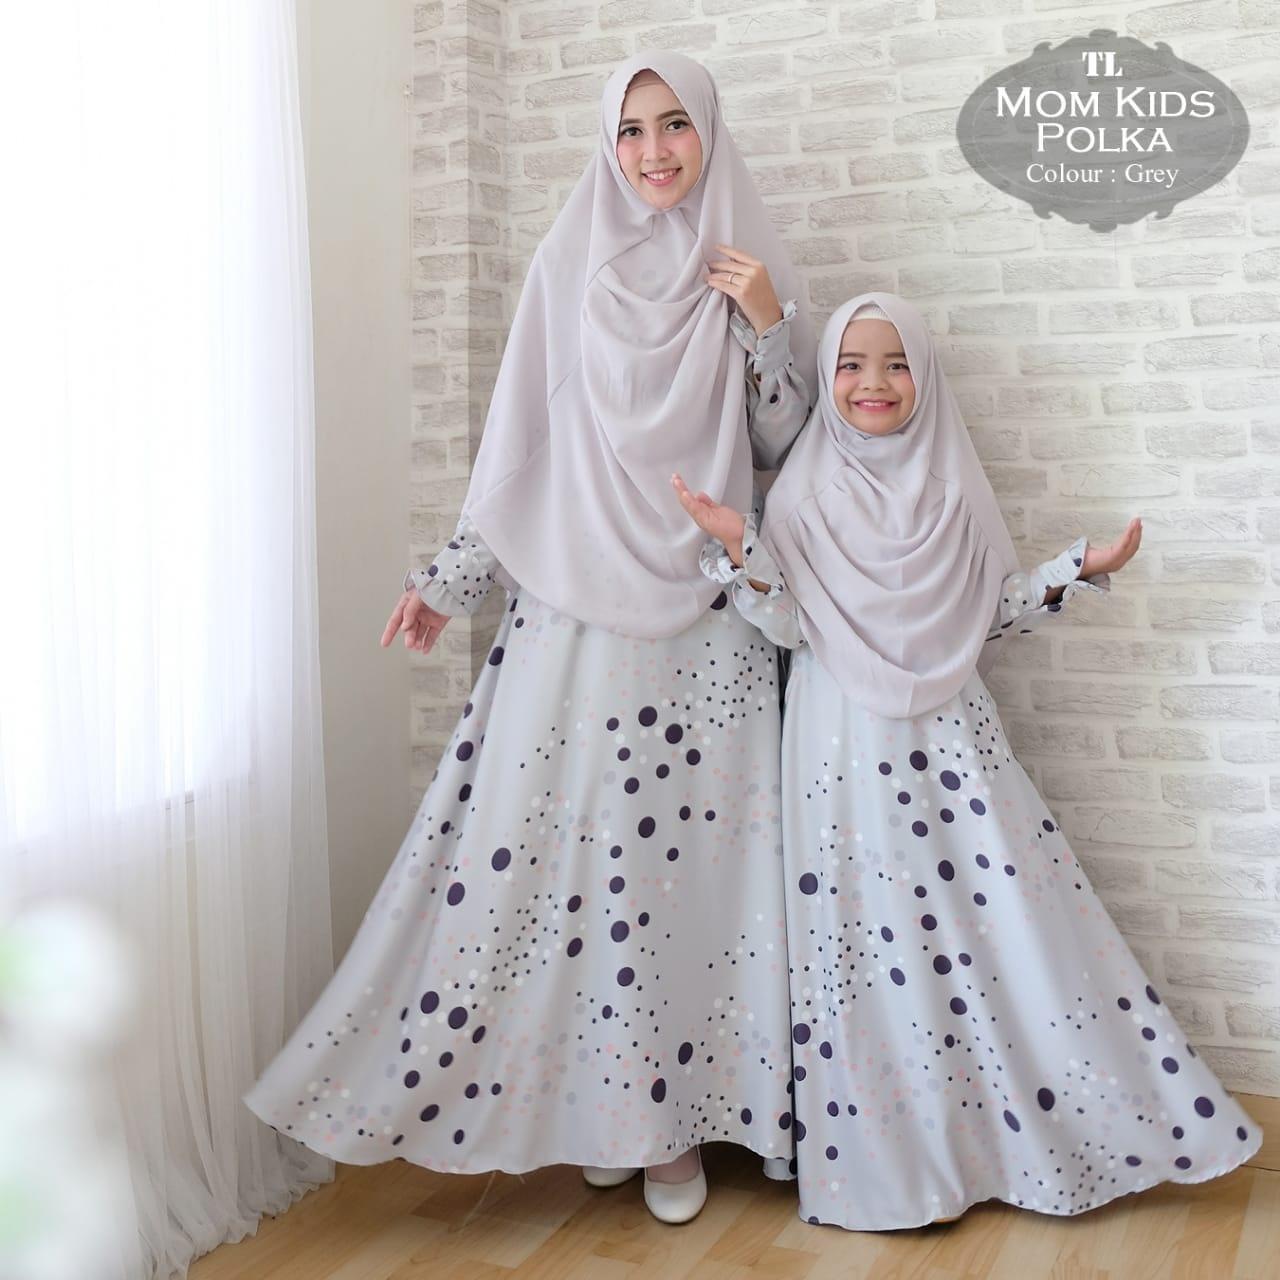 Silentriver88 gamis muslim syar'i maxmara lux polka ibu dan anak couple